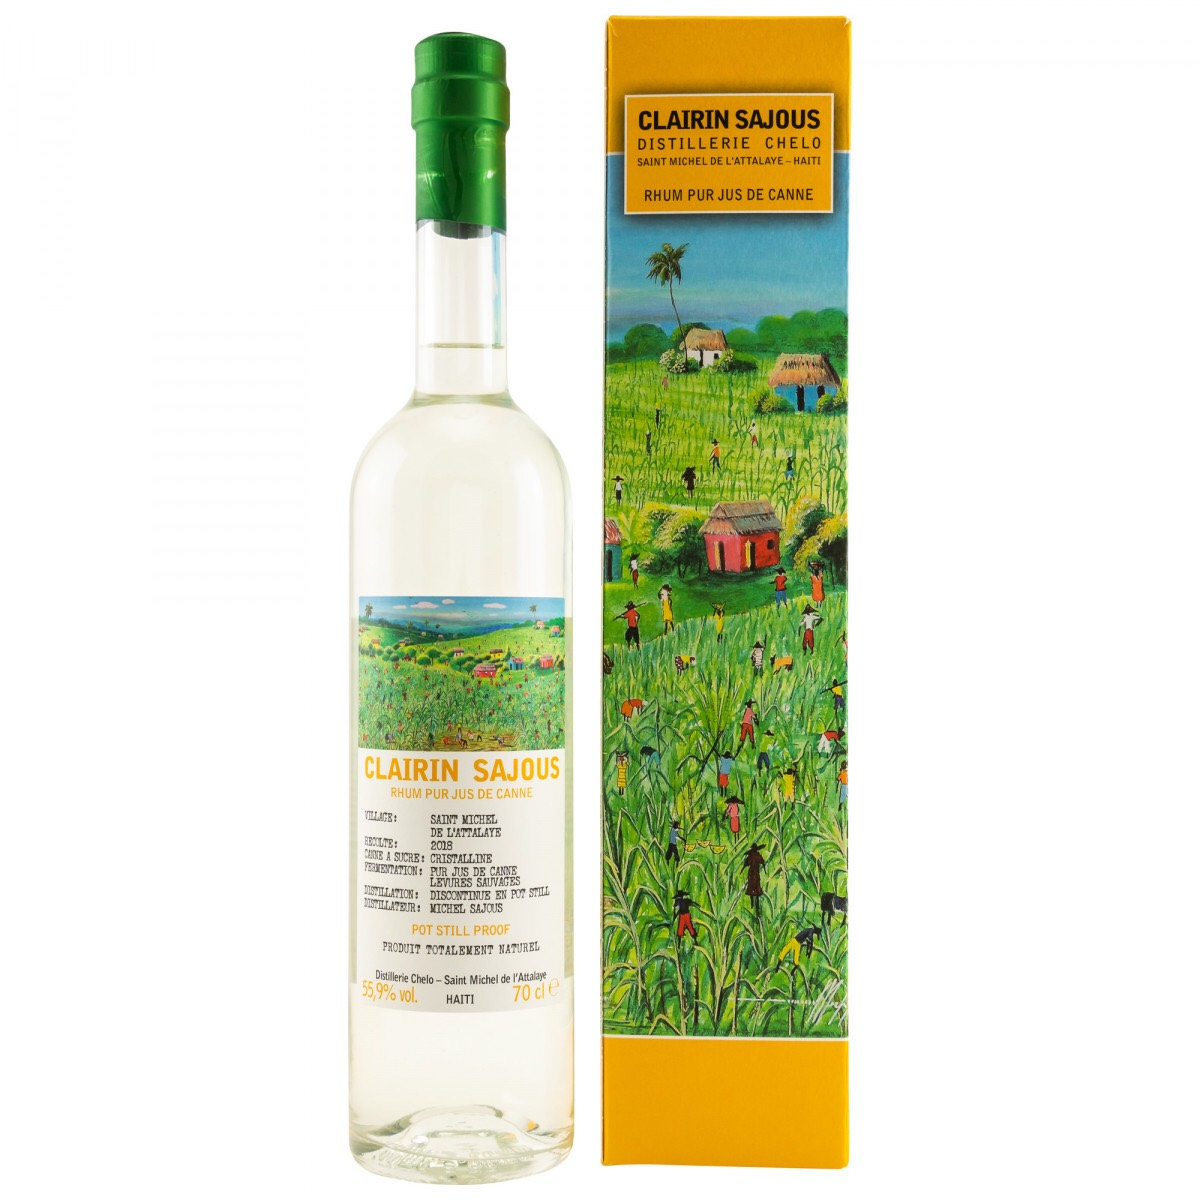 Bottle image of Clairin Sajous